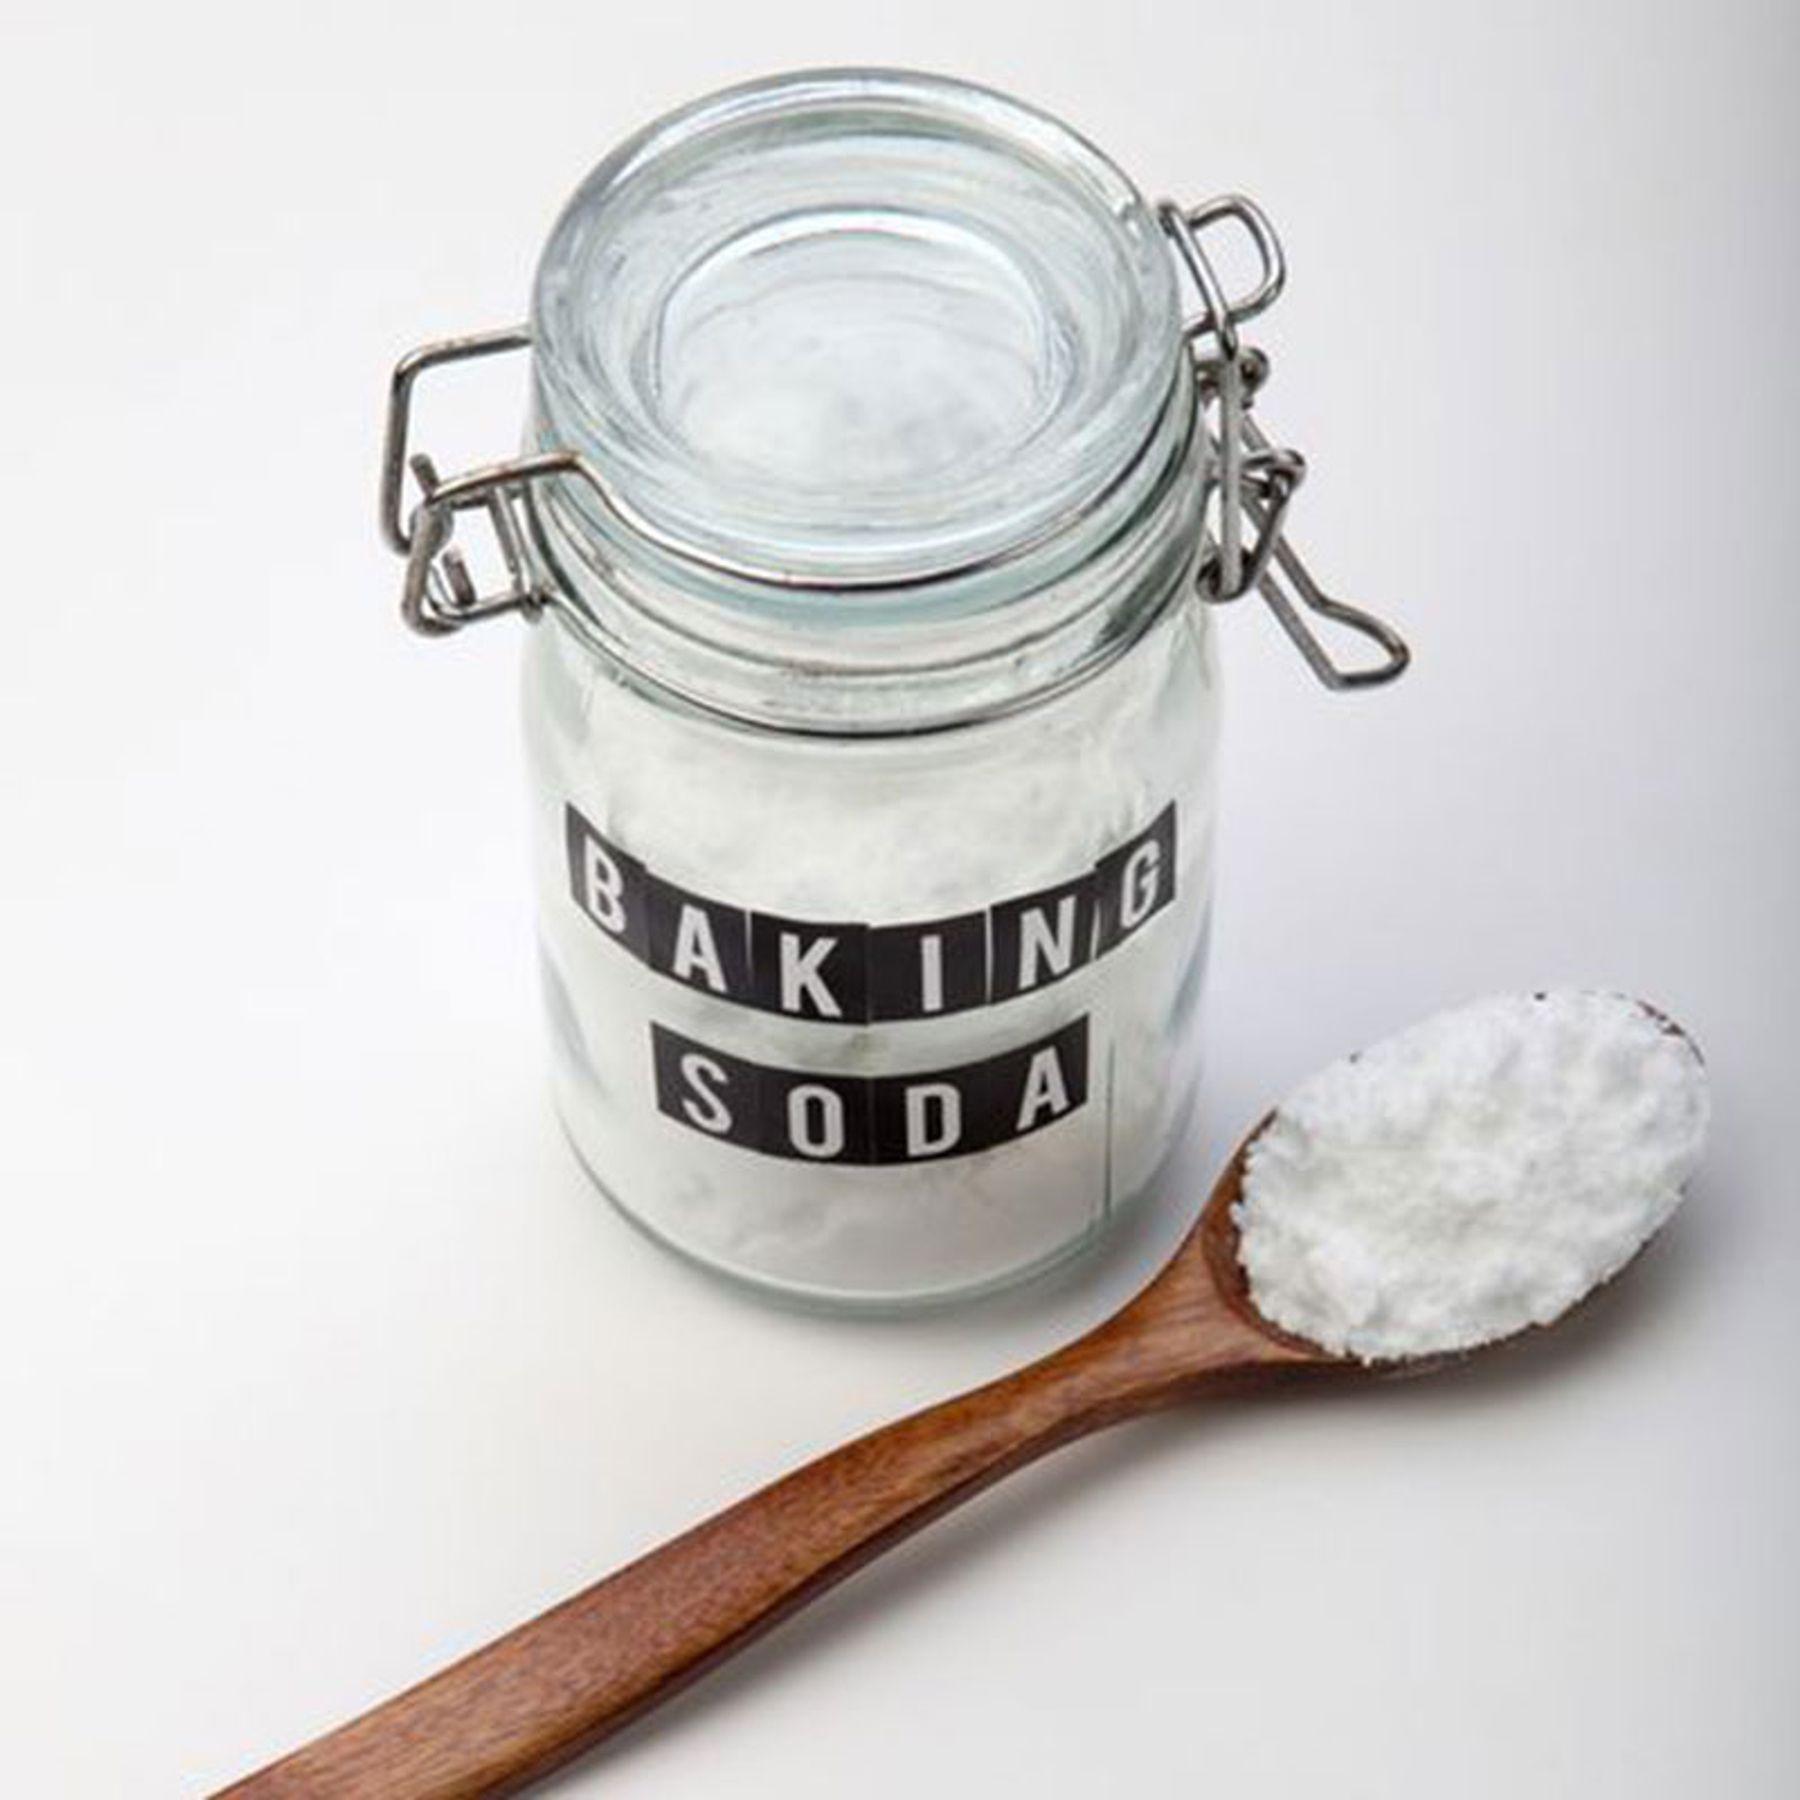 cach duoi chuot bang baking soda